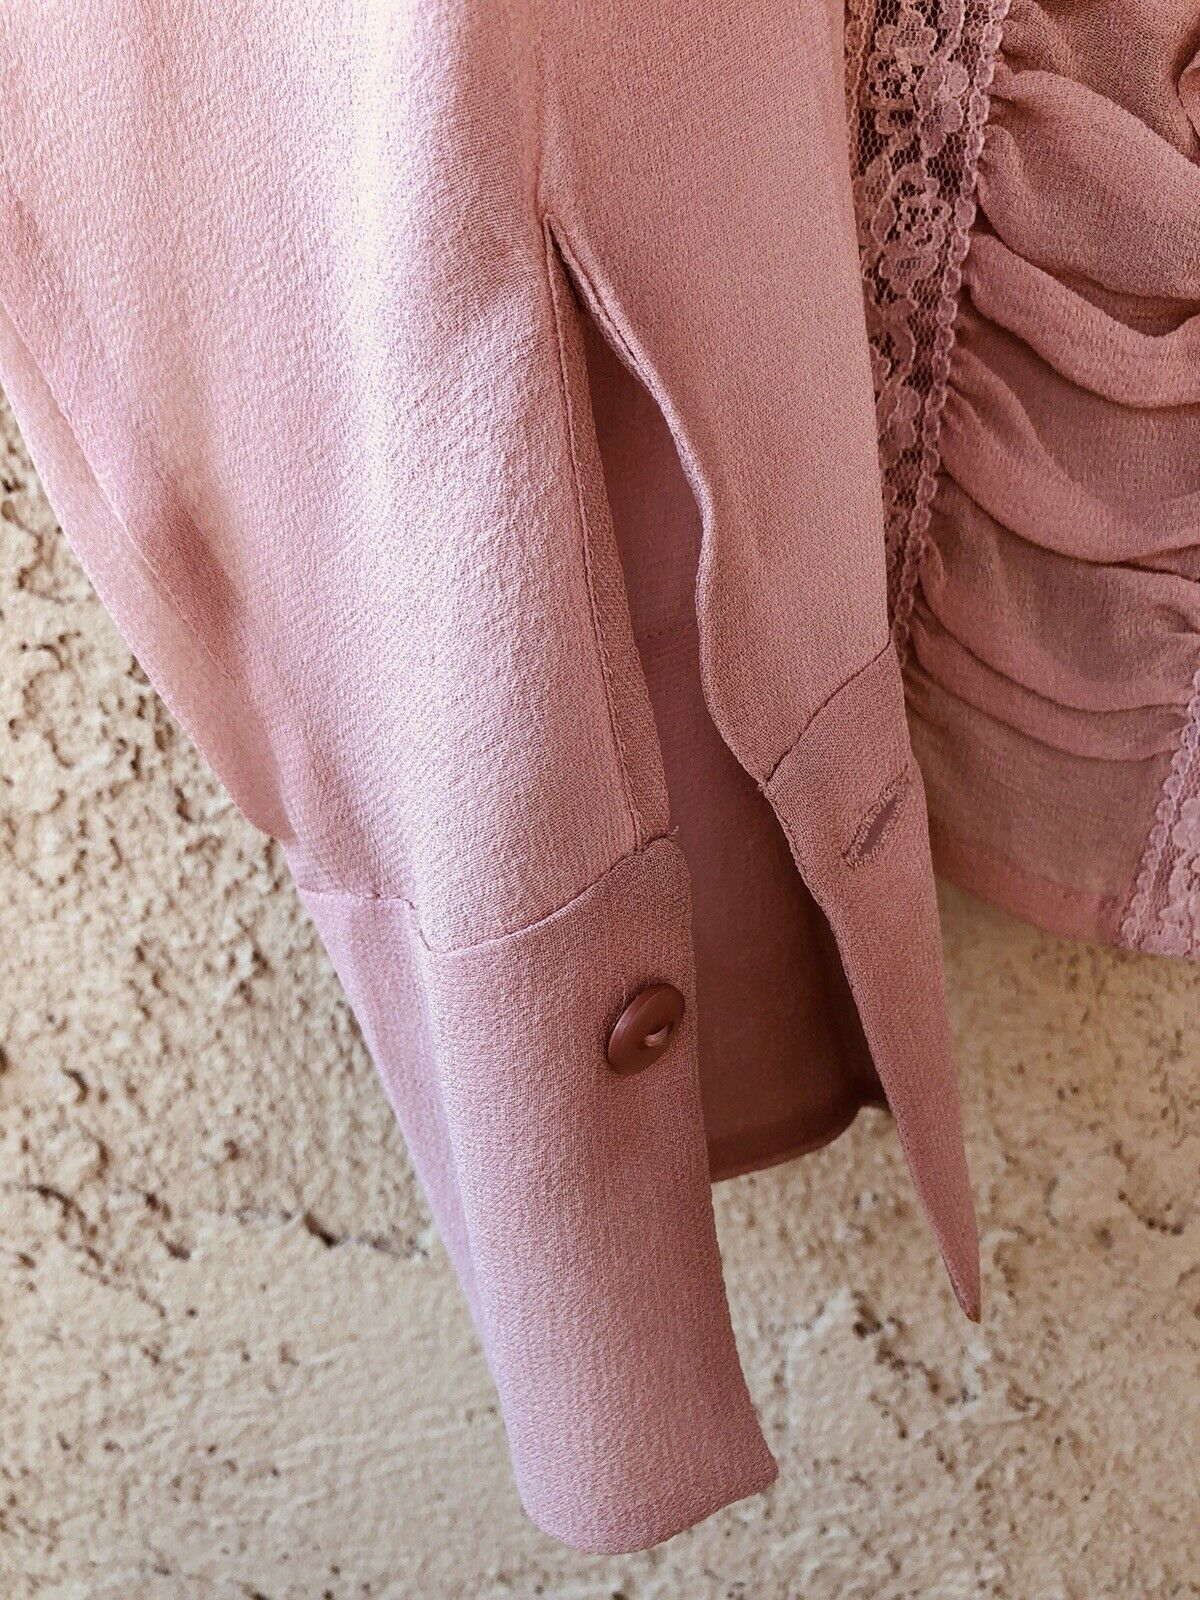 Vintage Stunning Jones Wear Silk Sheer Dusty Lila… - image 6